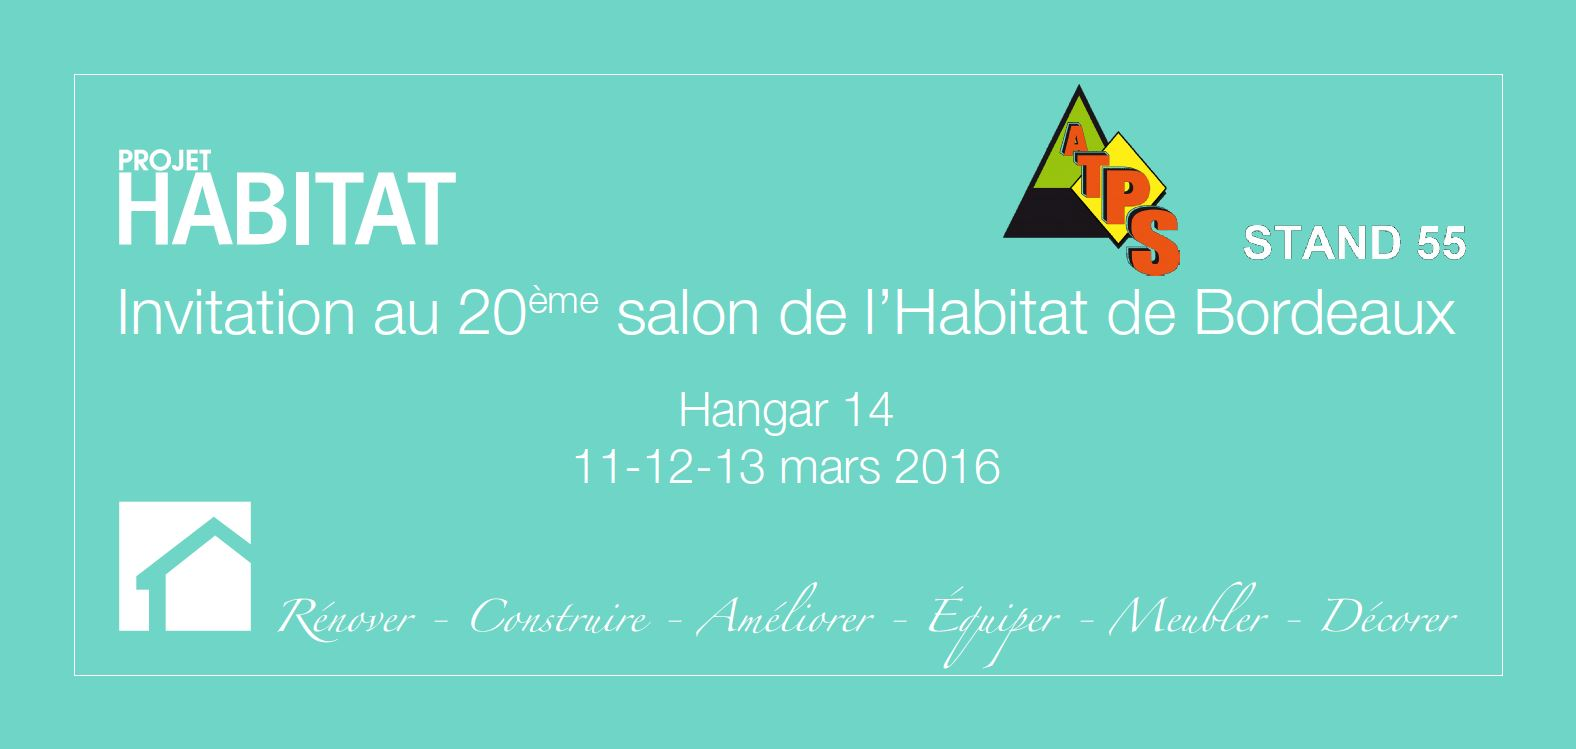 Salon projet habitat atps ossature bois for Salon habitat bordeaux